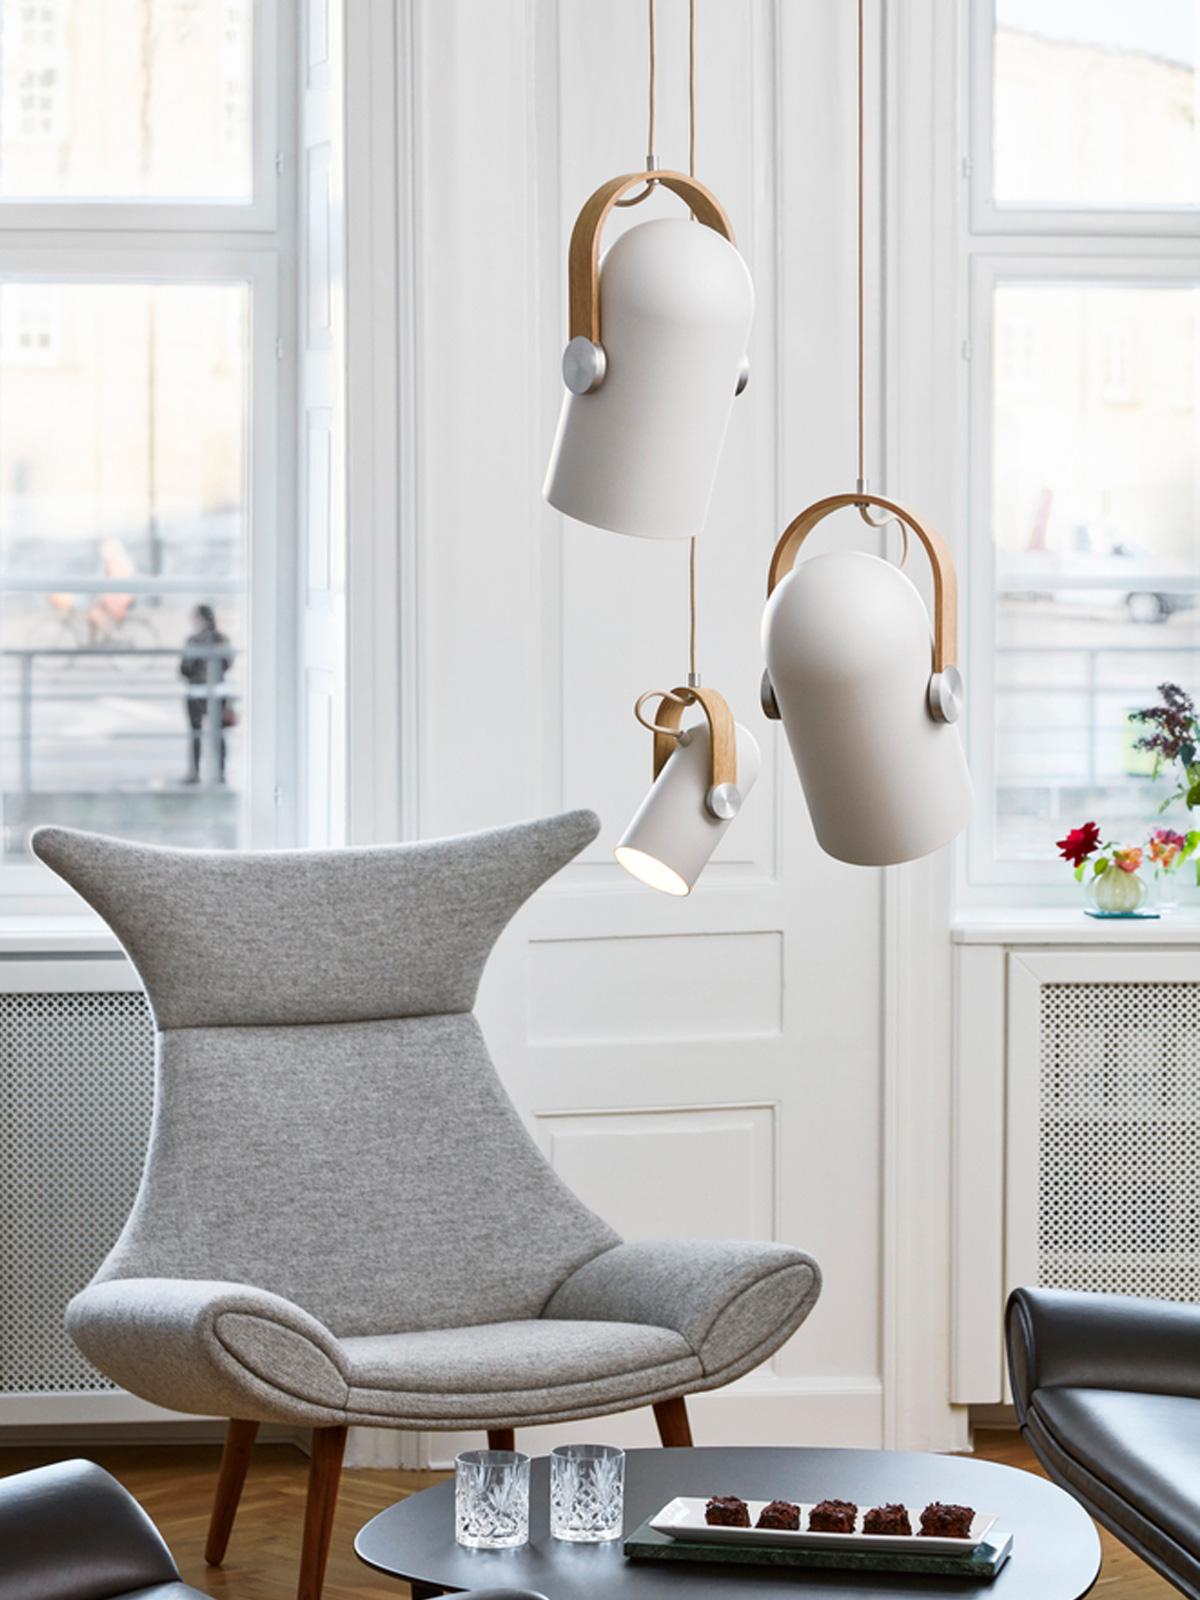 Carronade Pendelleuchten Le Klint DesignOrt Onlineshop Berlin Lampen Designerleuchten